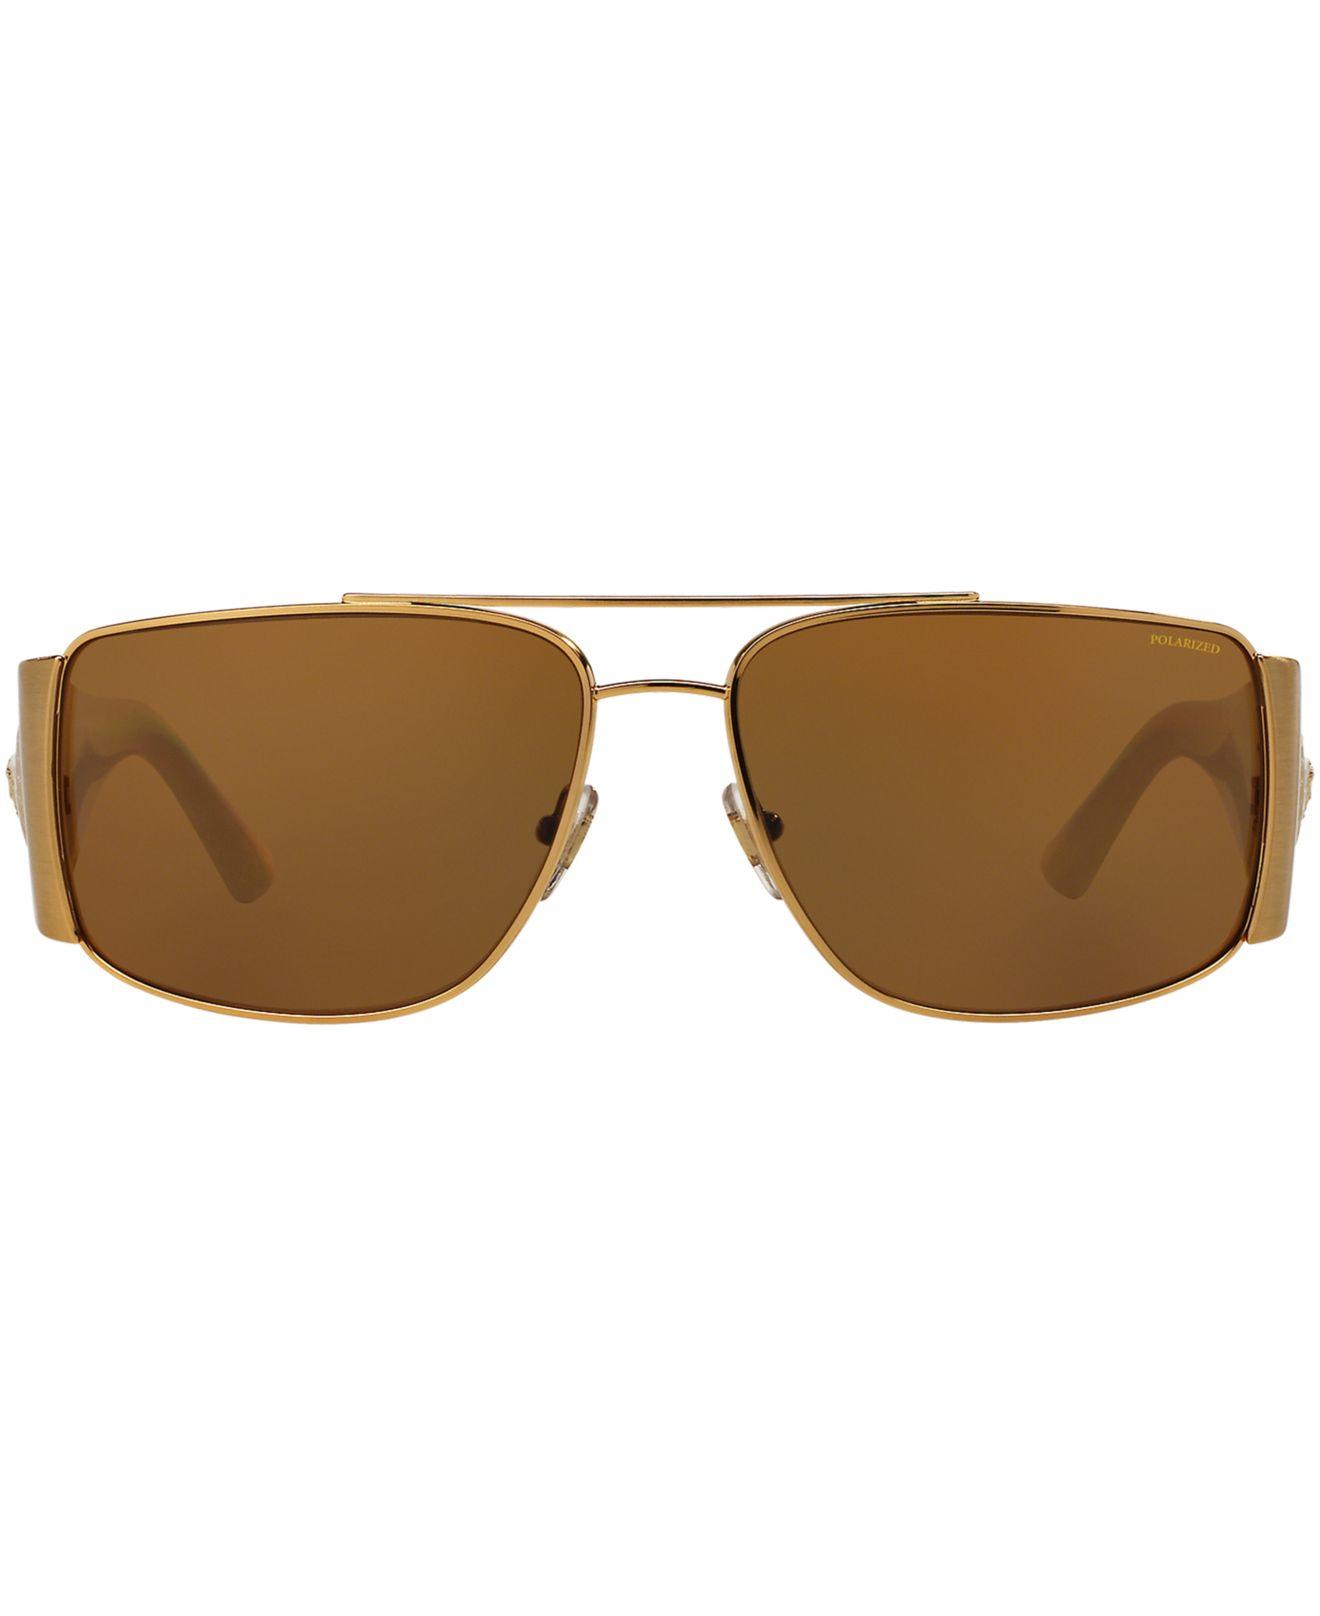 7bd3a155d901 Versace Sunglasses 2015 Men In India